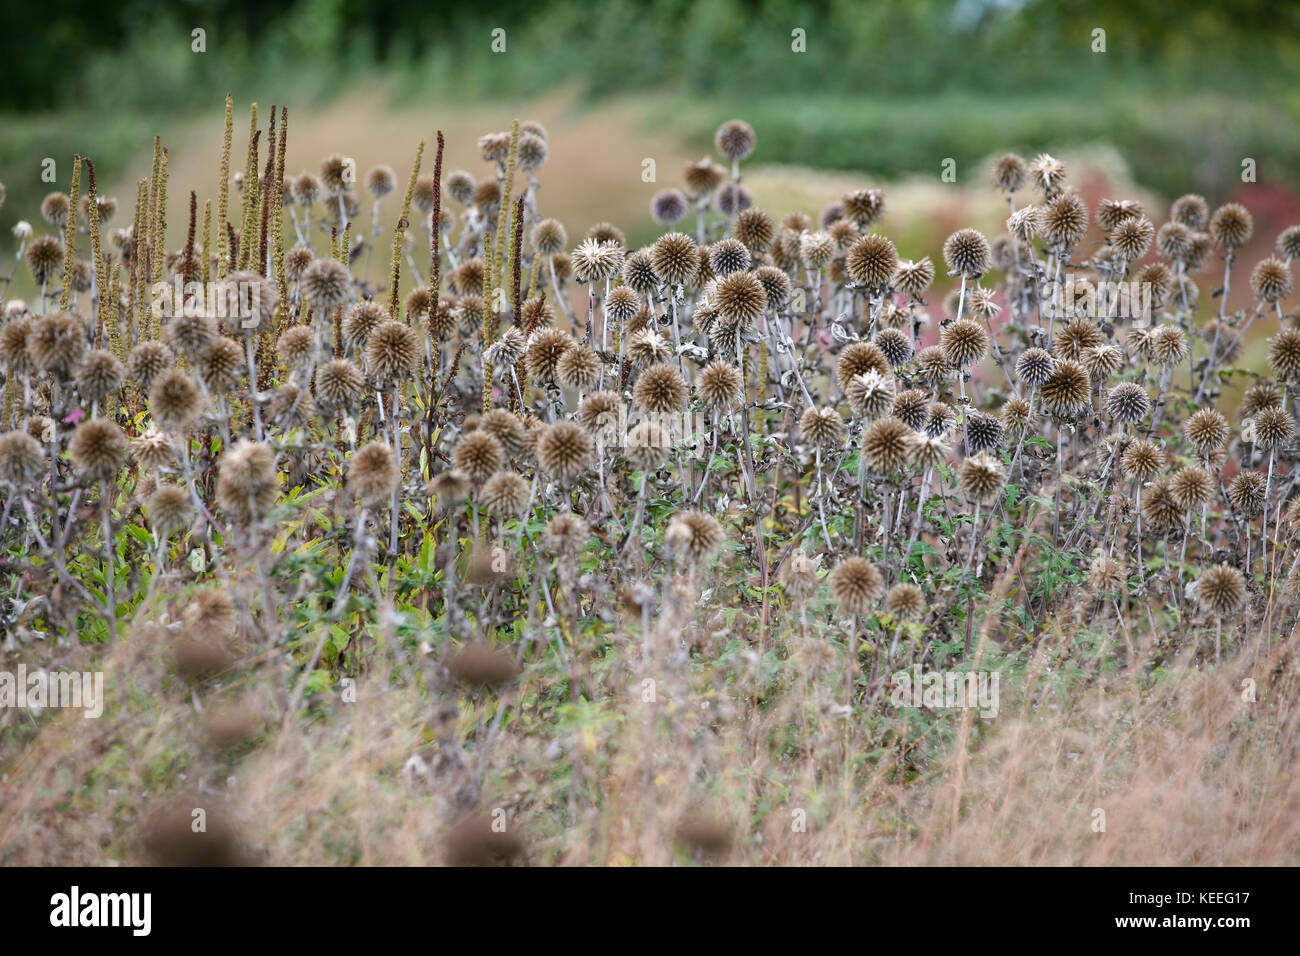 Echinops ritro Samenköpfe in Gräsern, Herbst Interesse im Garten Stockbild